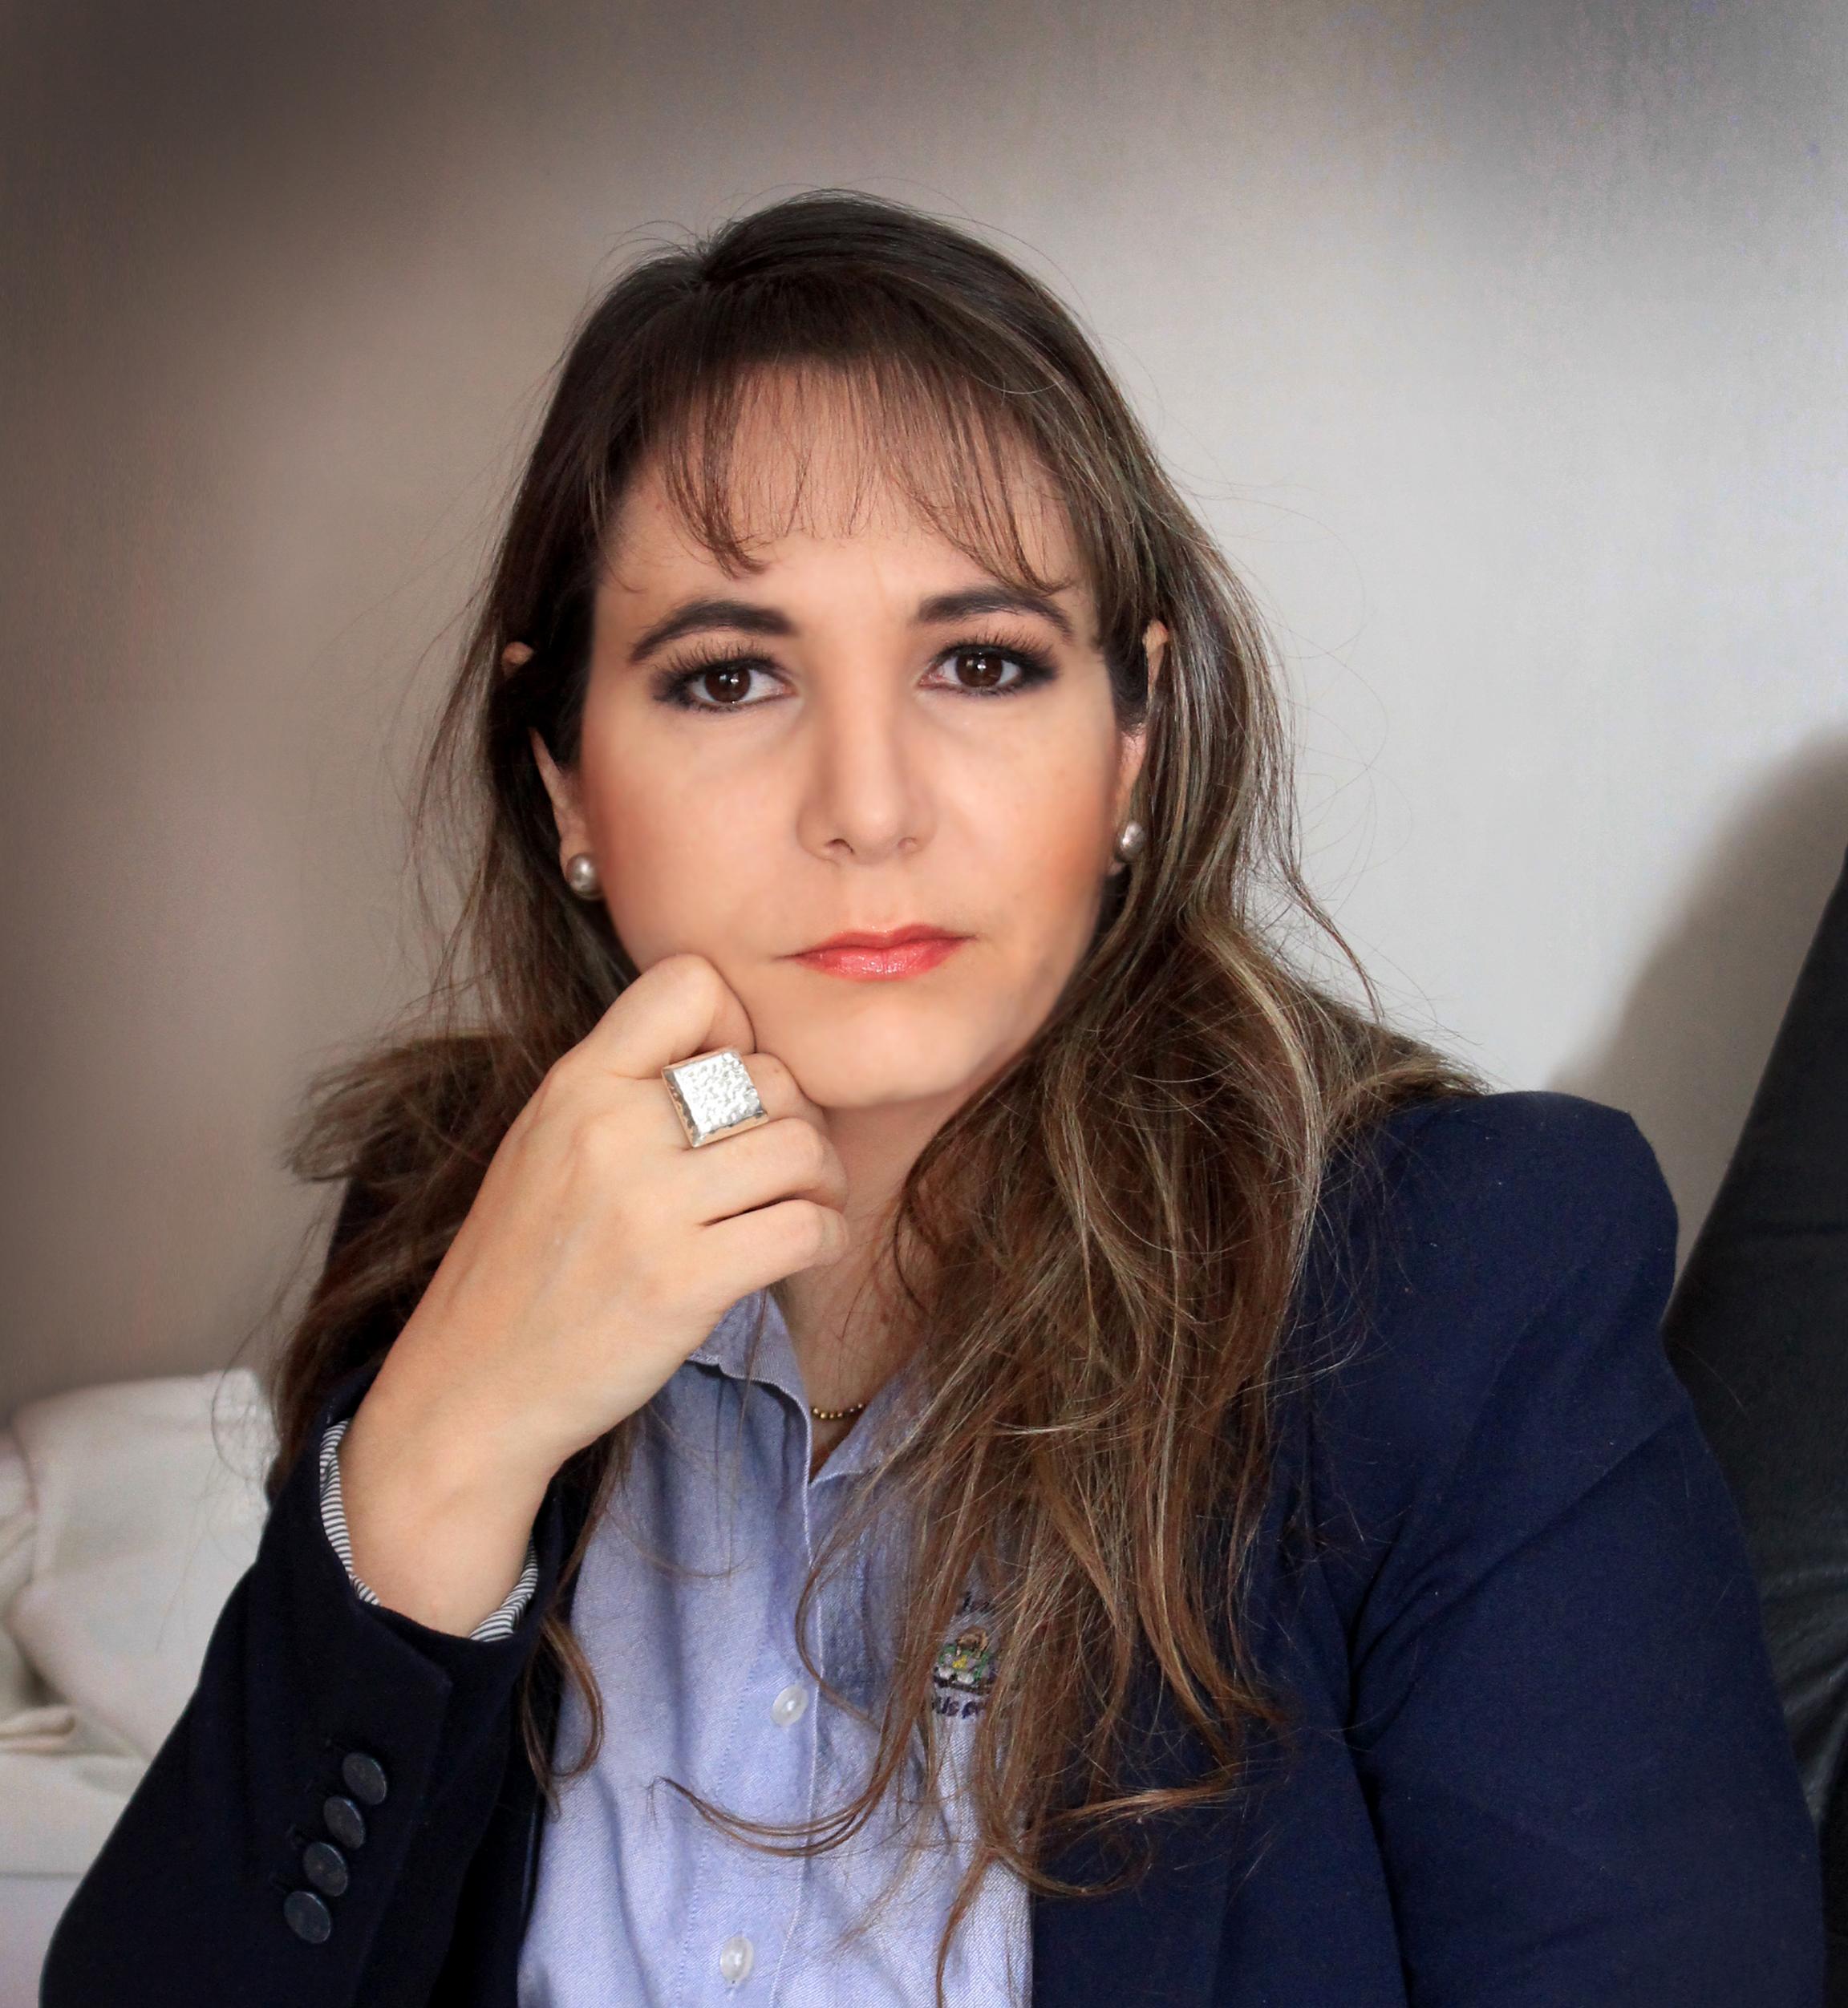 Ana Patricia Franco